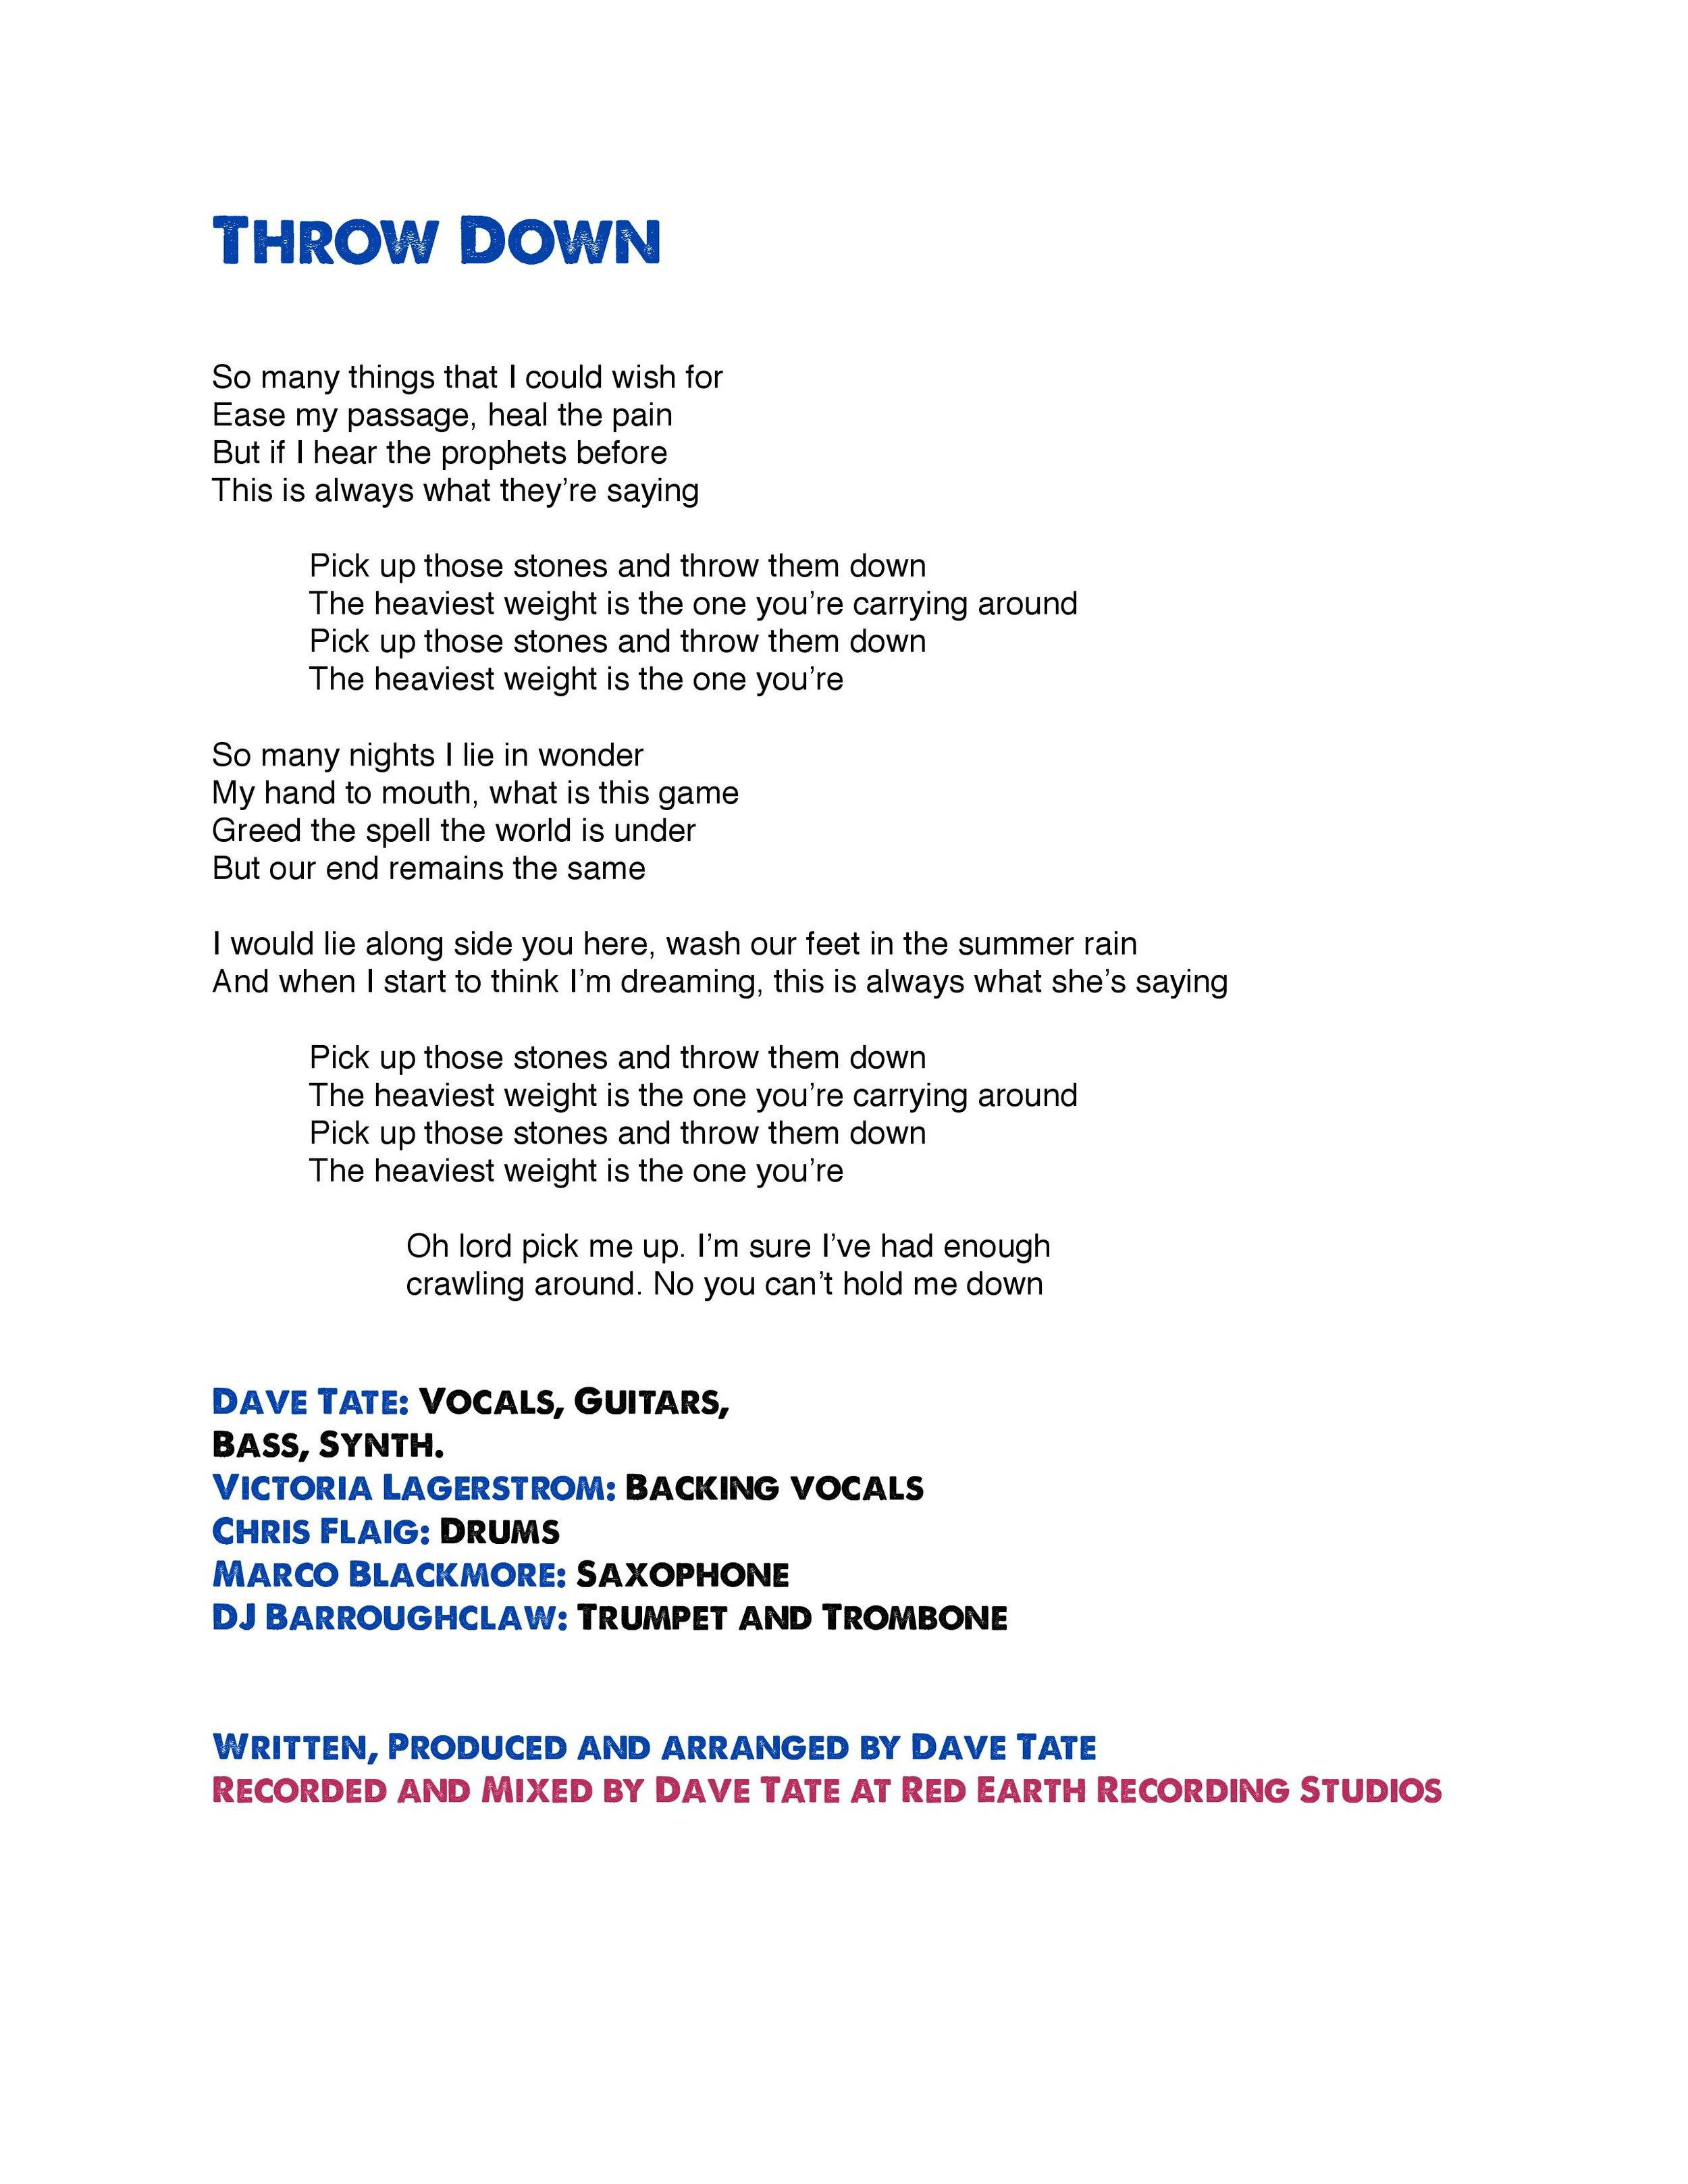 5 Throw Down Lyrics-page-001.jpg